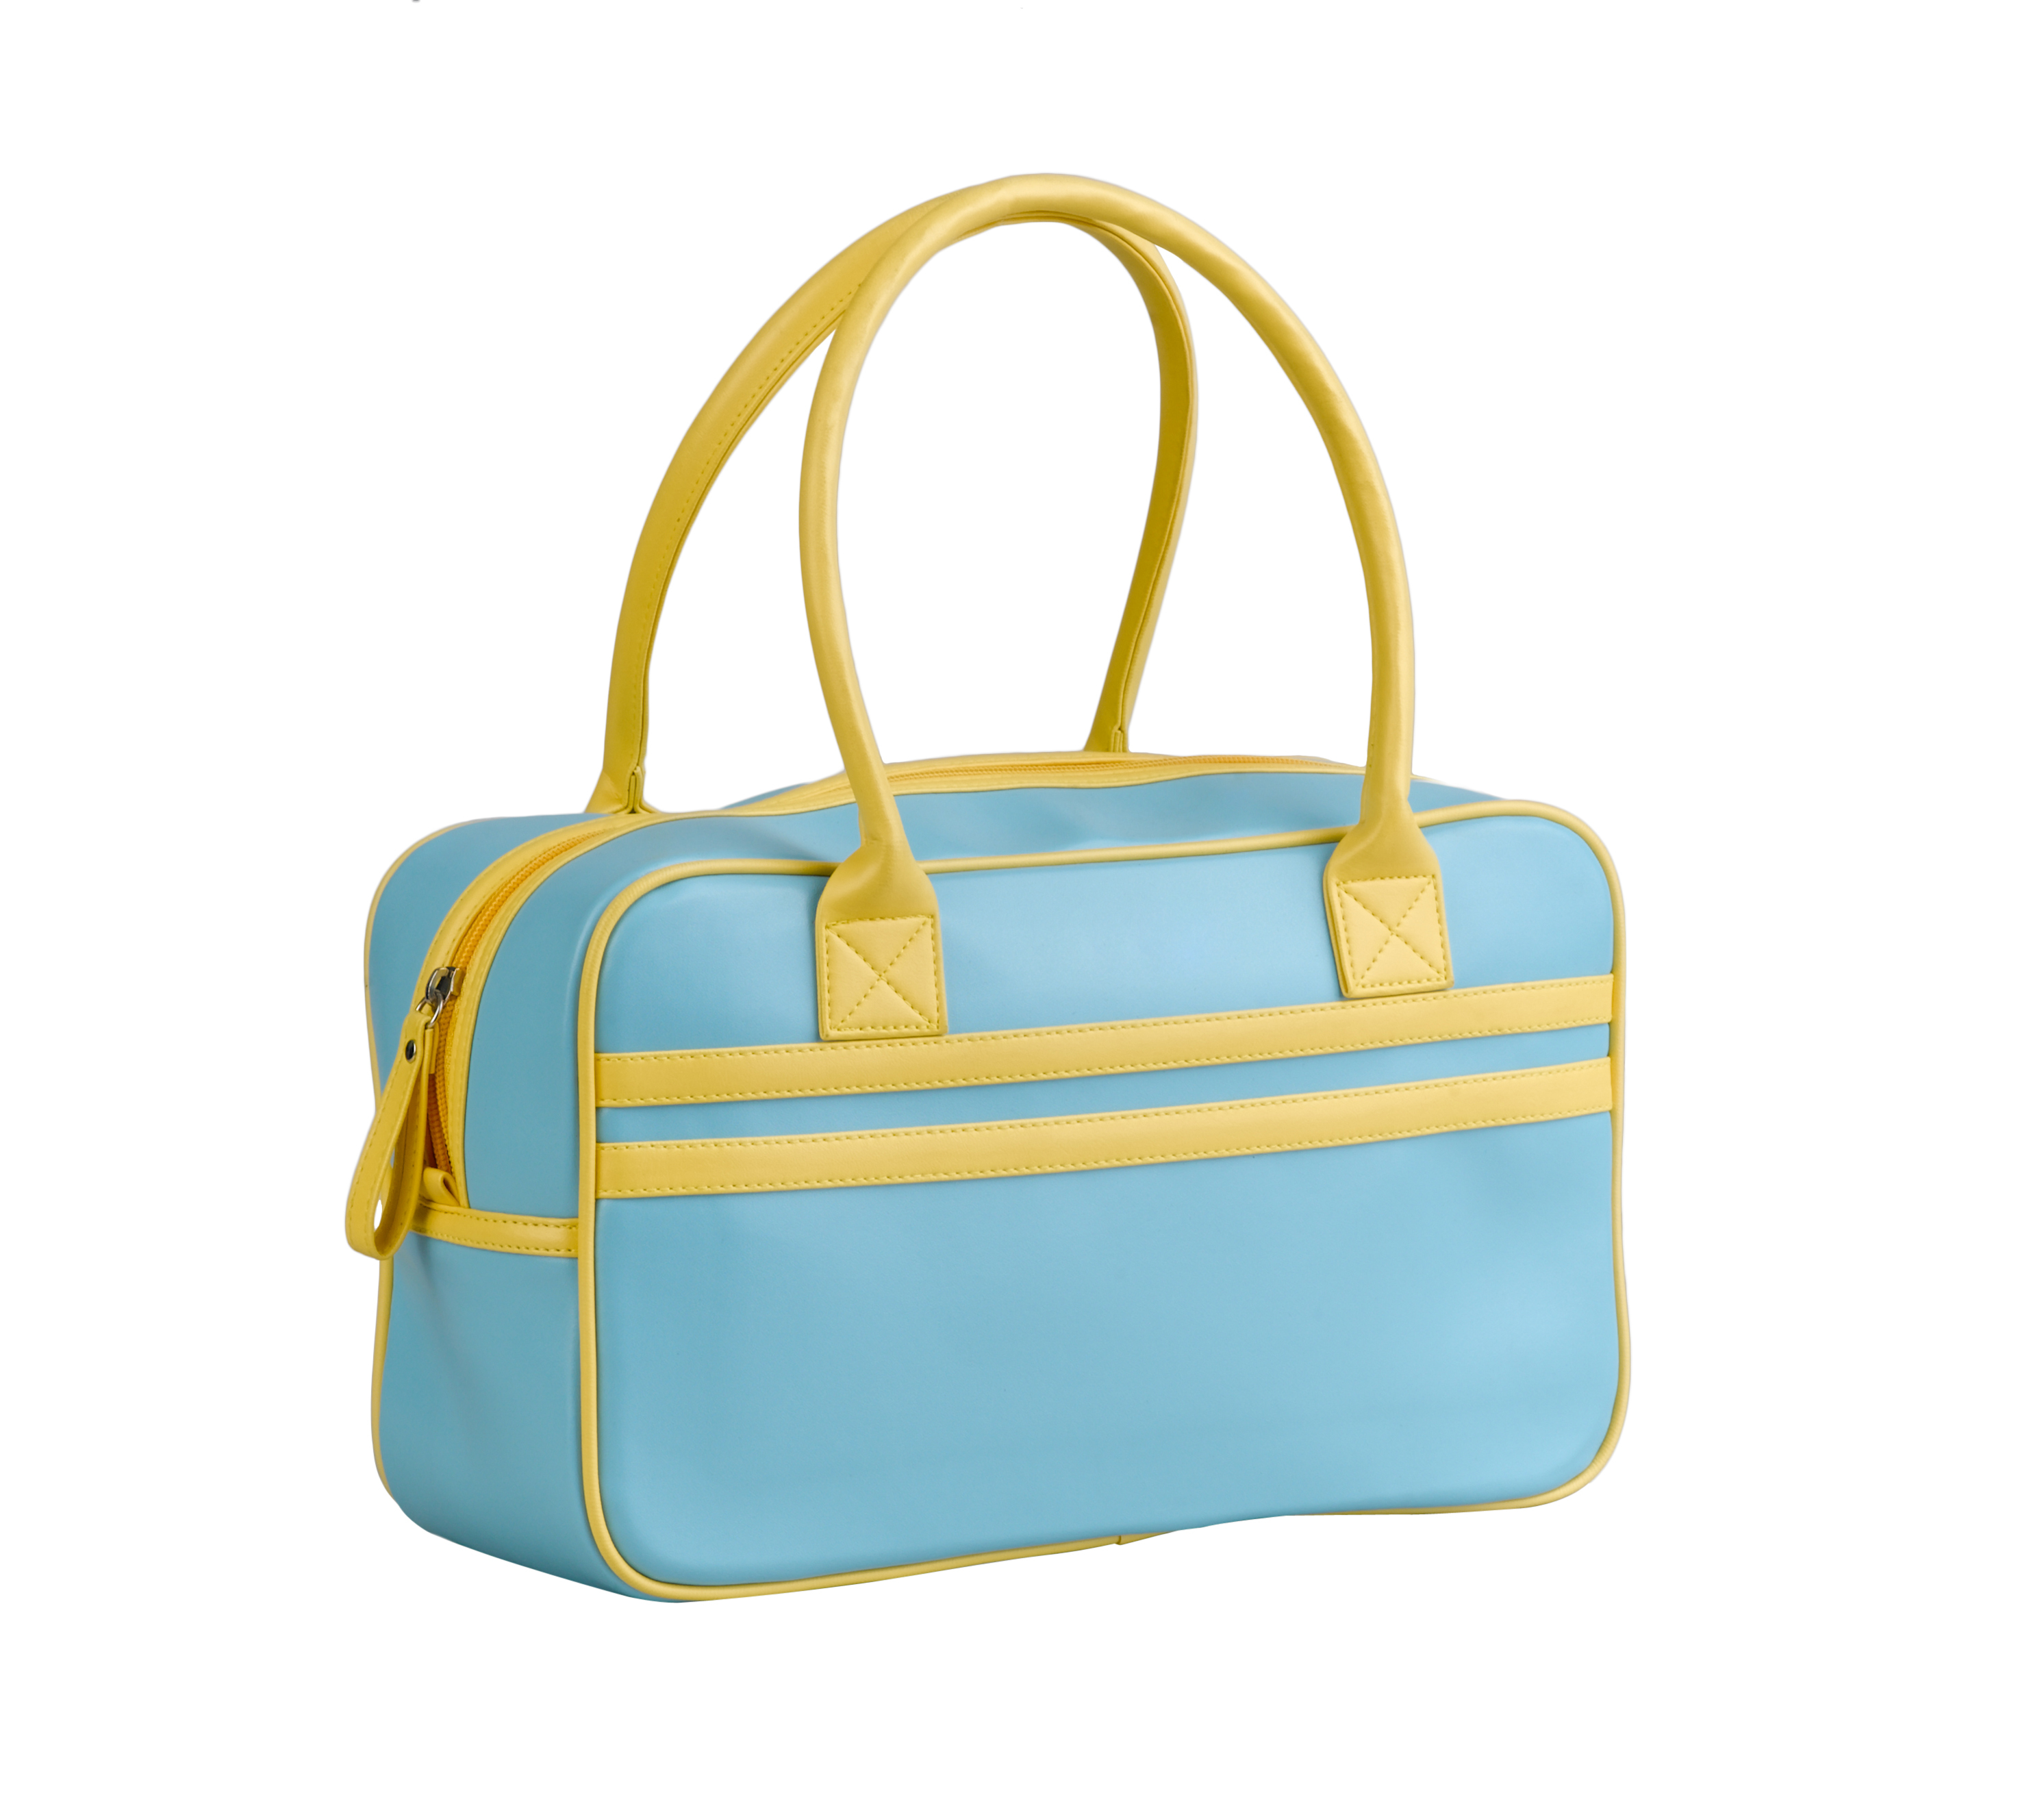 Bespoke bags